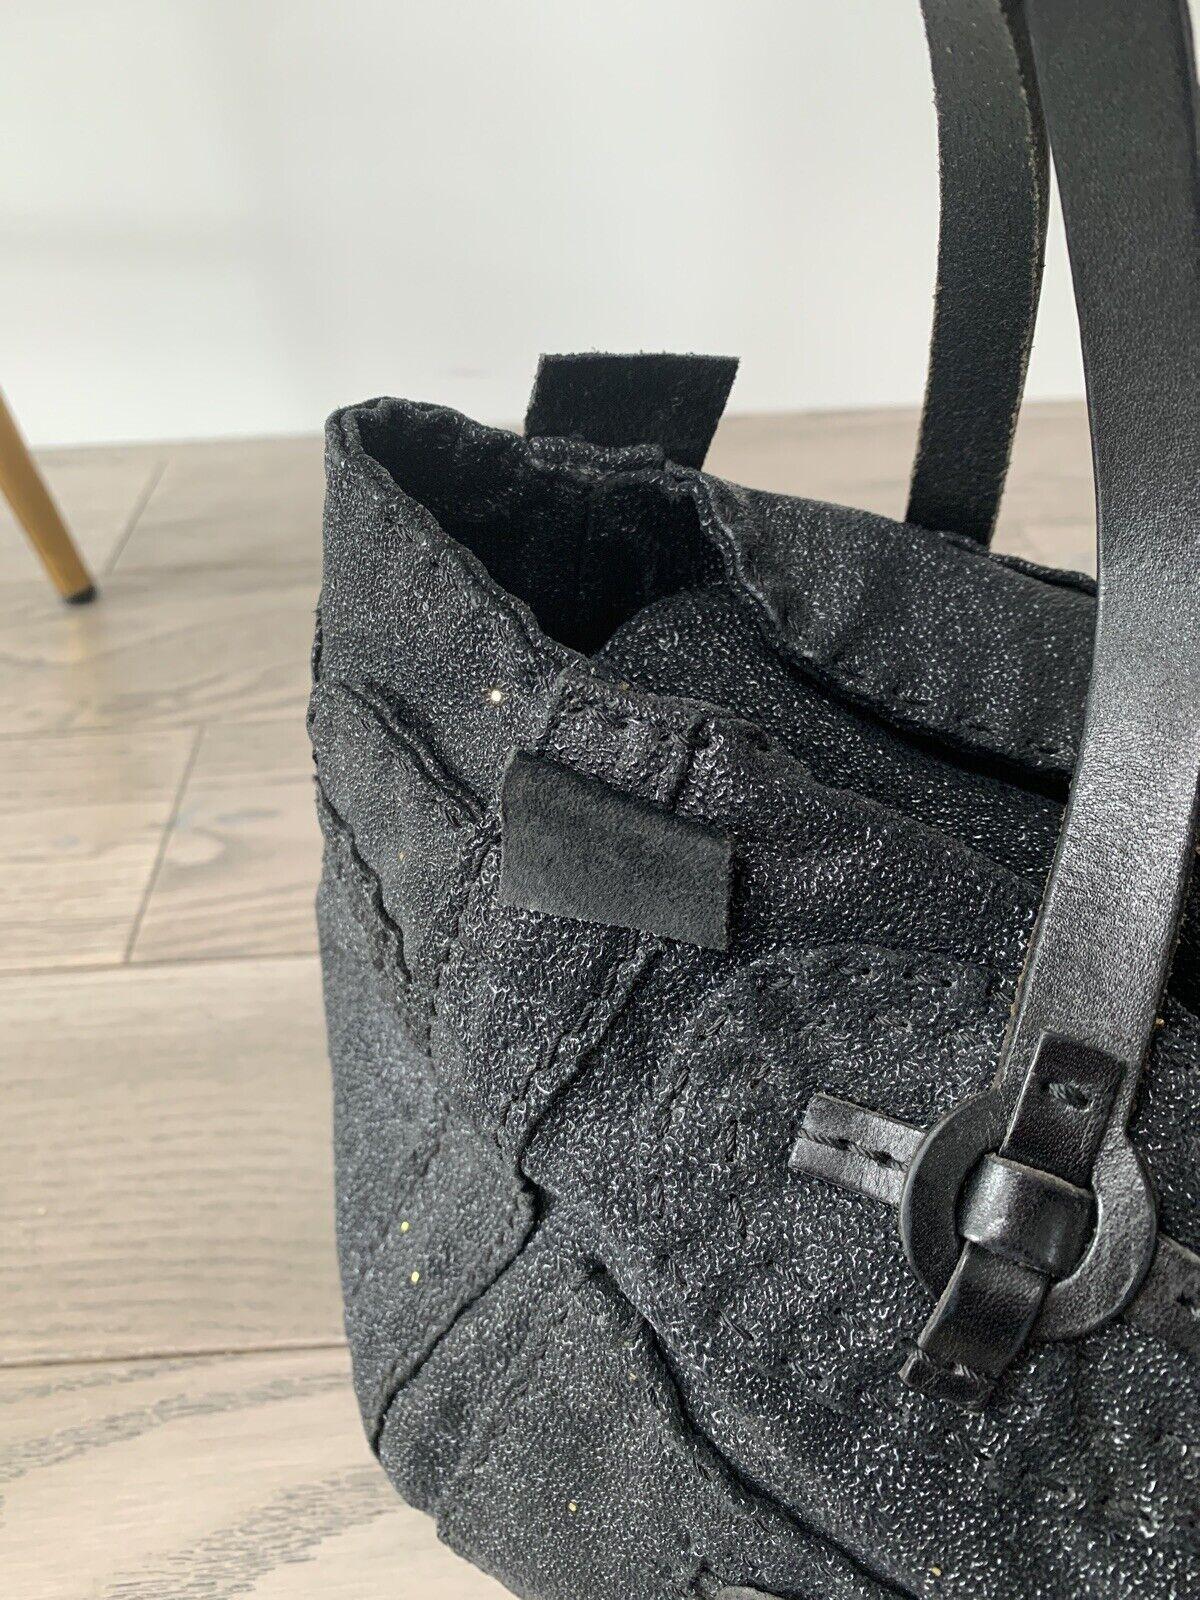 jamin puech handbags - image 3